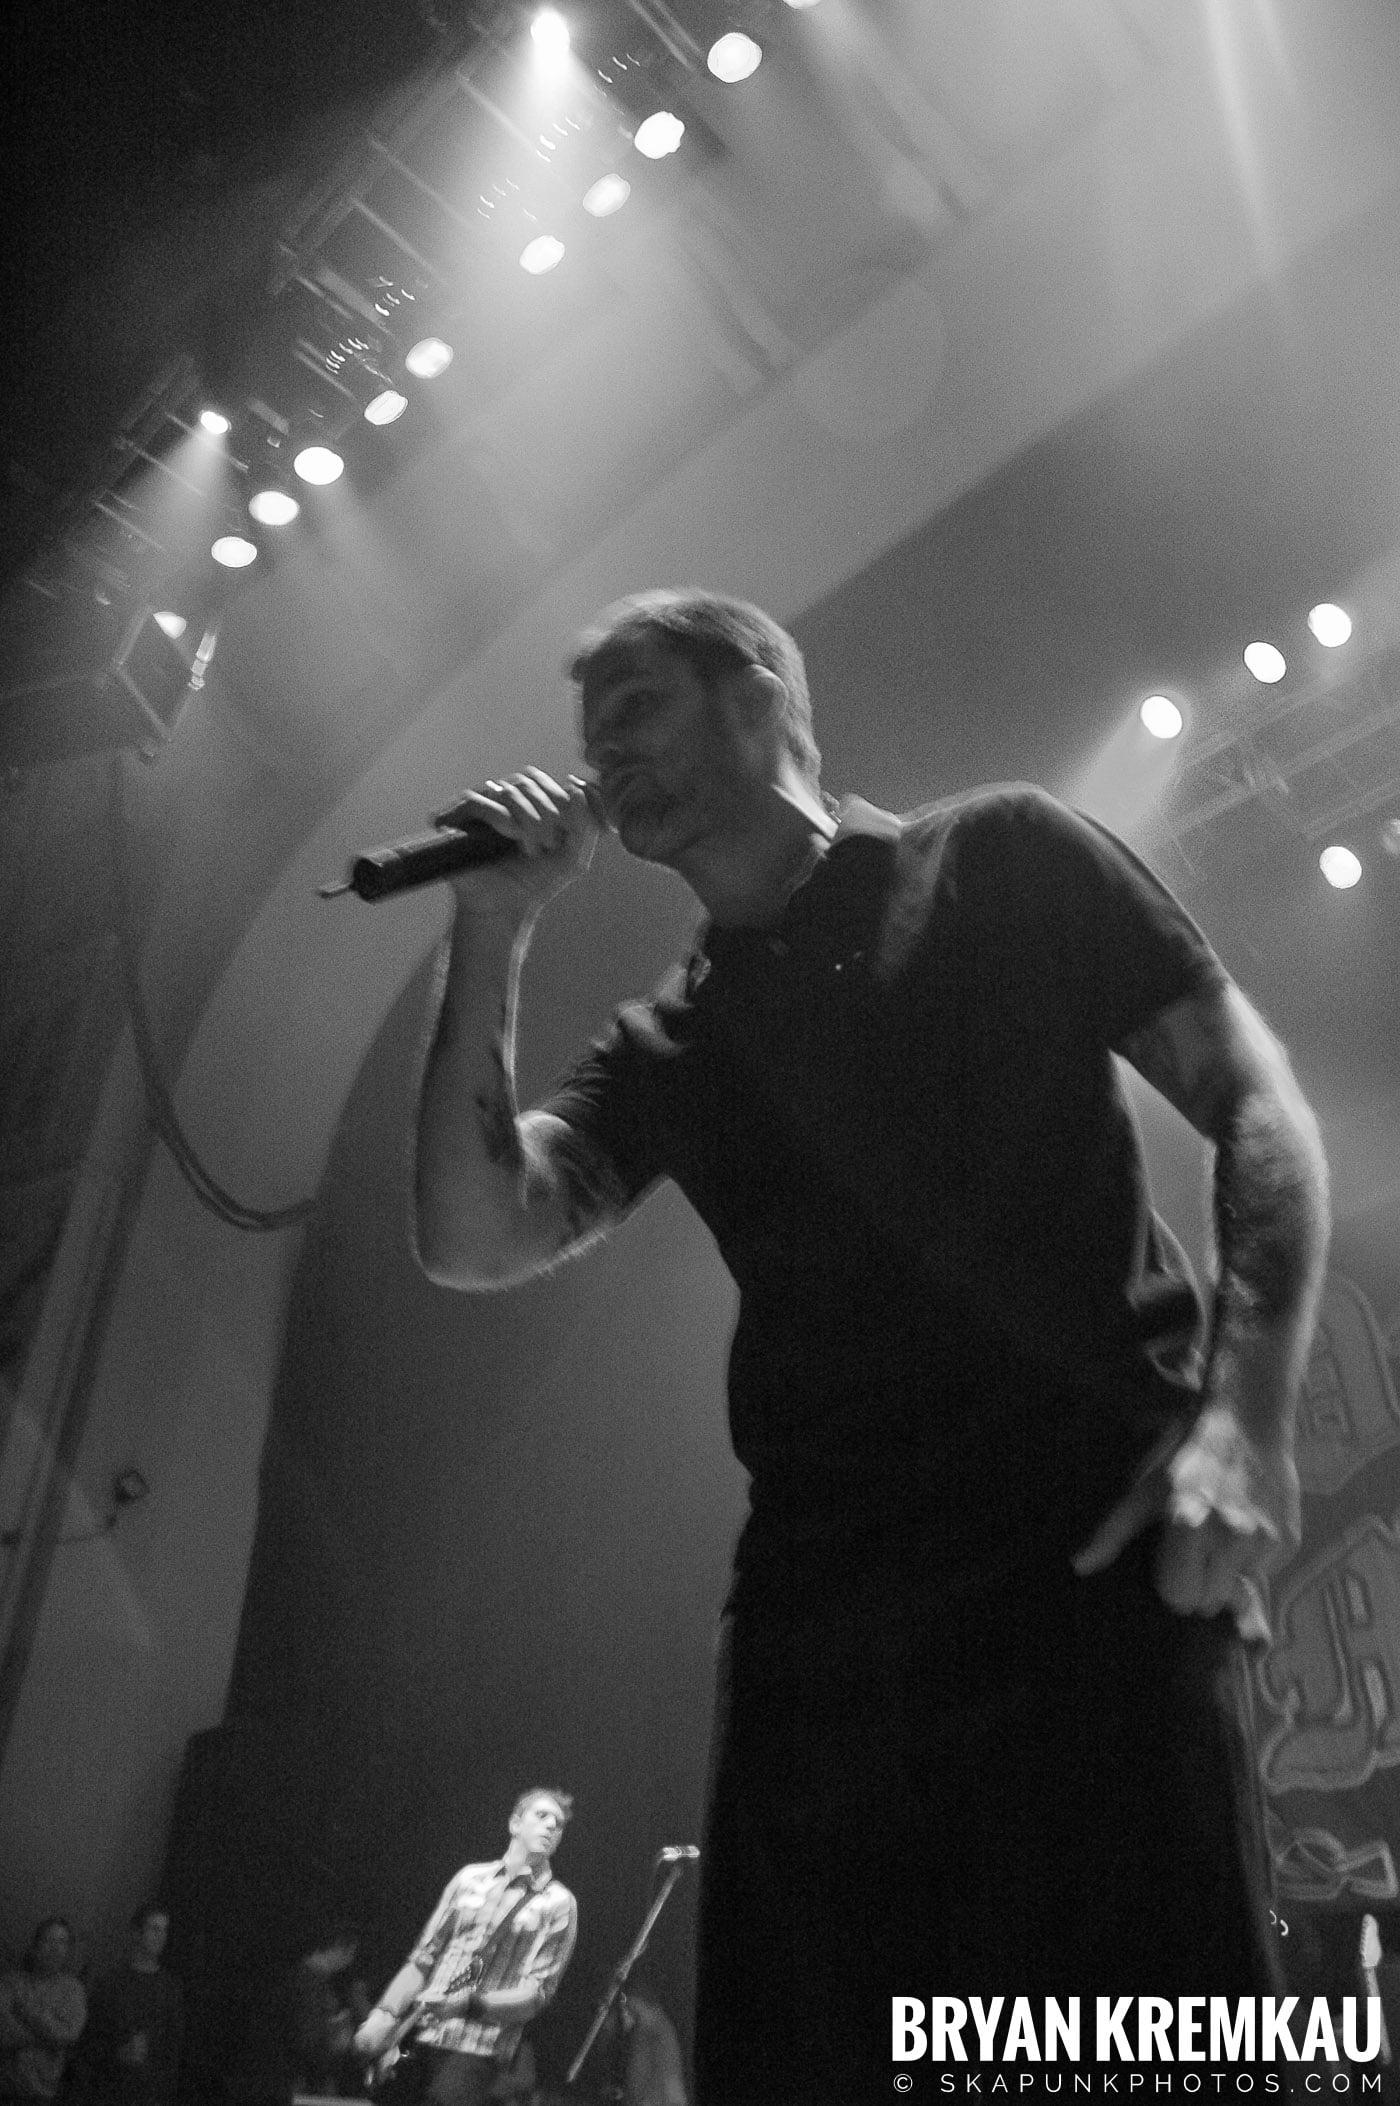 Dropkick Murphys @ Brixton Academy, London UK - 12.19.05 (11)